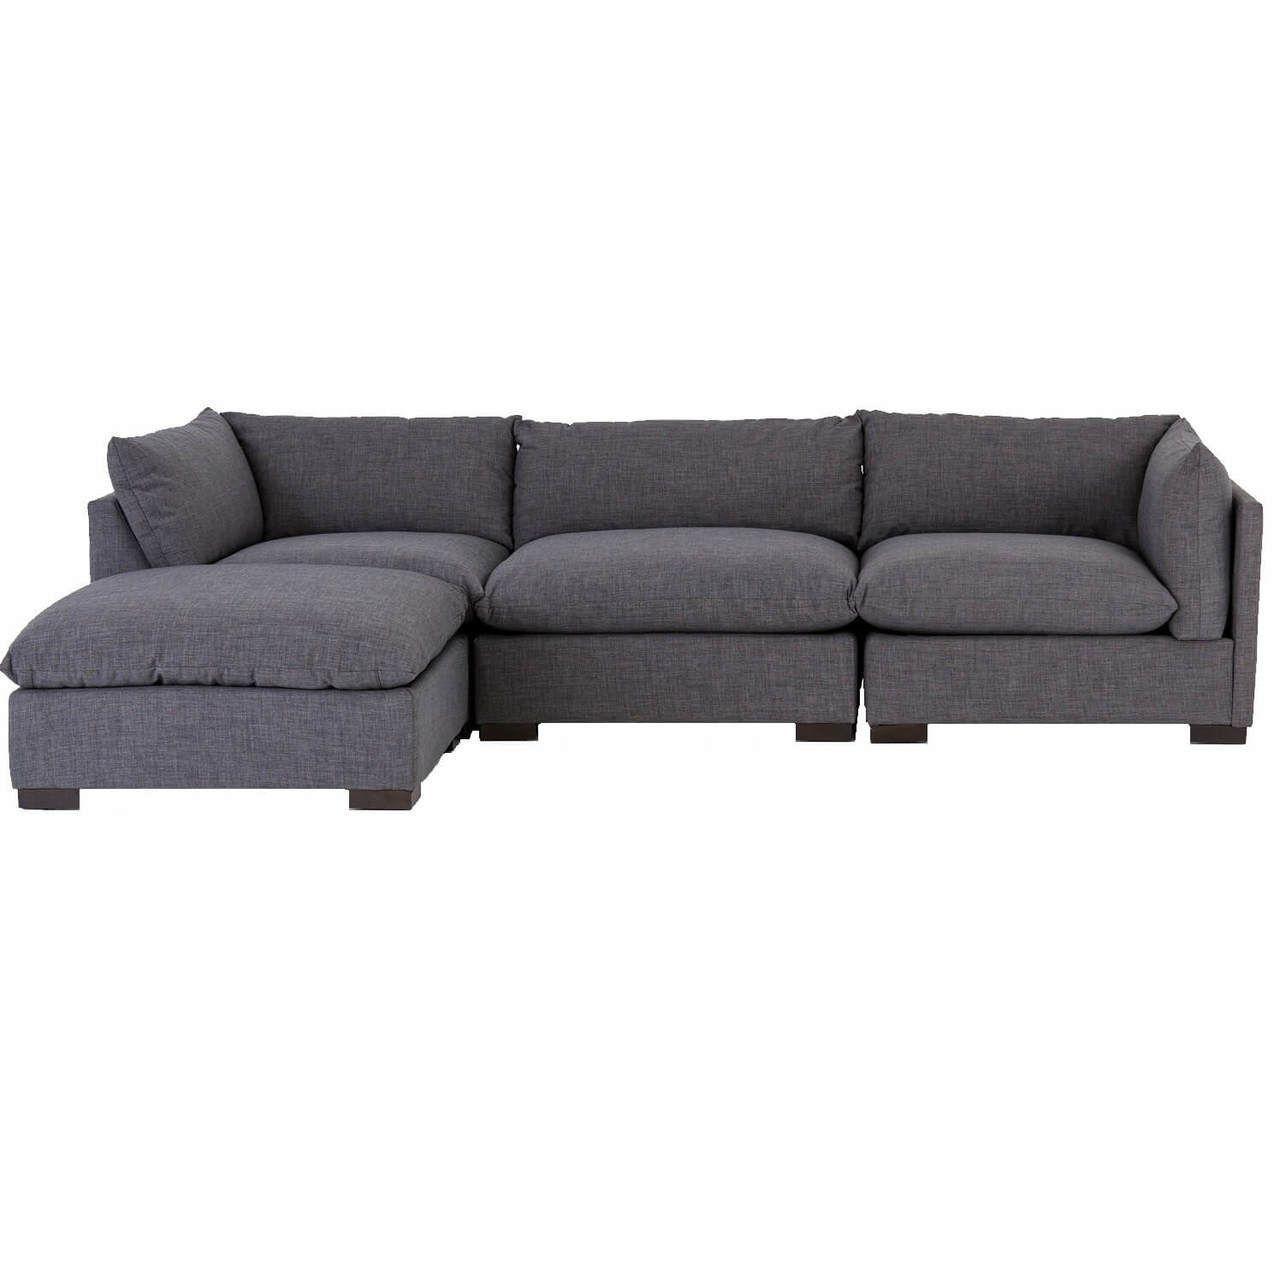 Westworld Modern Gray 4 Piece Modular Lounge Sectional Sofa Modular Lounges Sectional Sofa Sectional